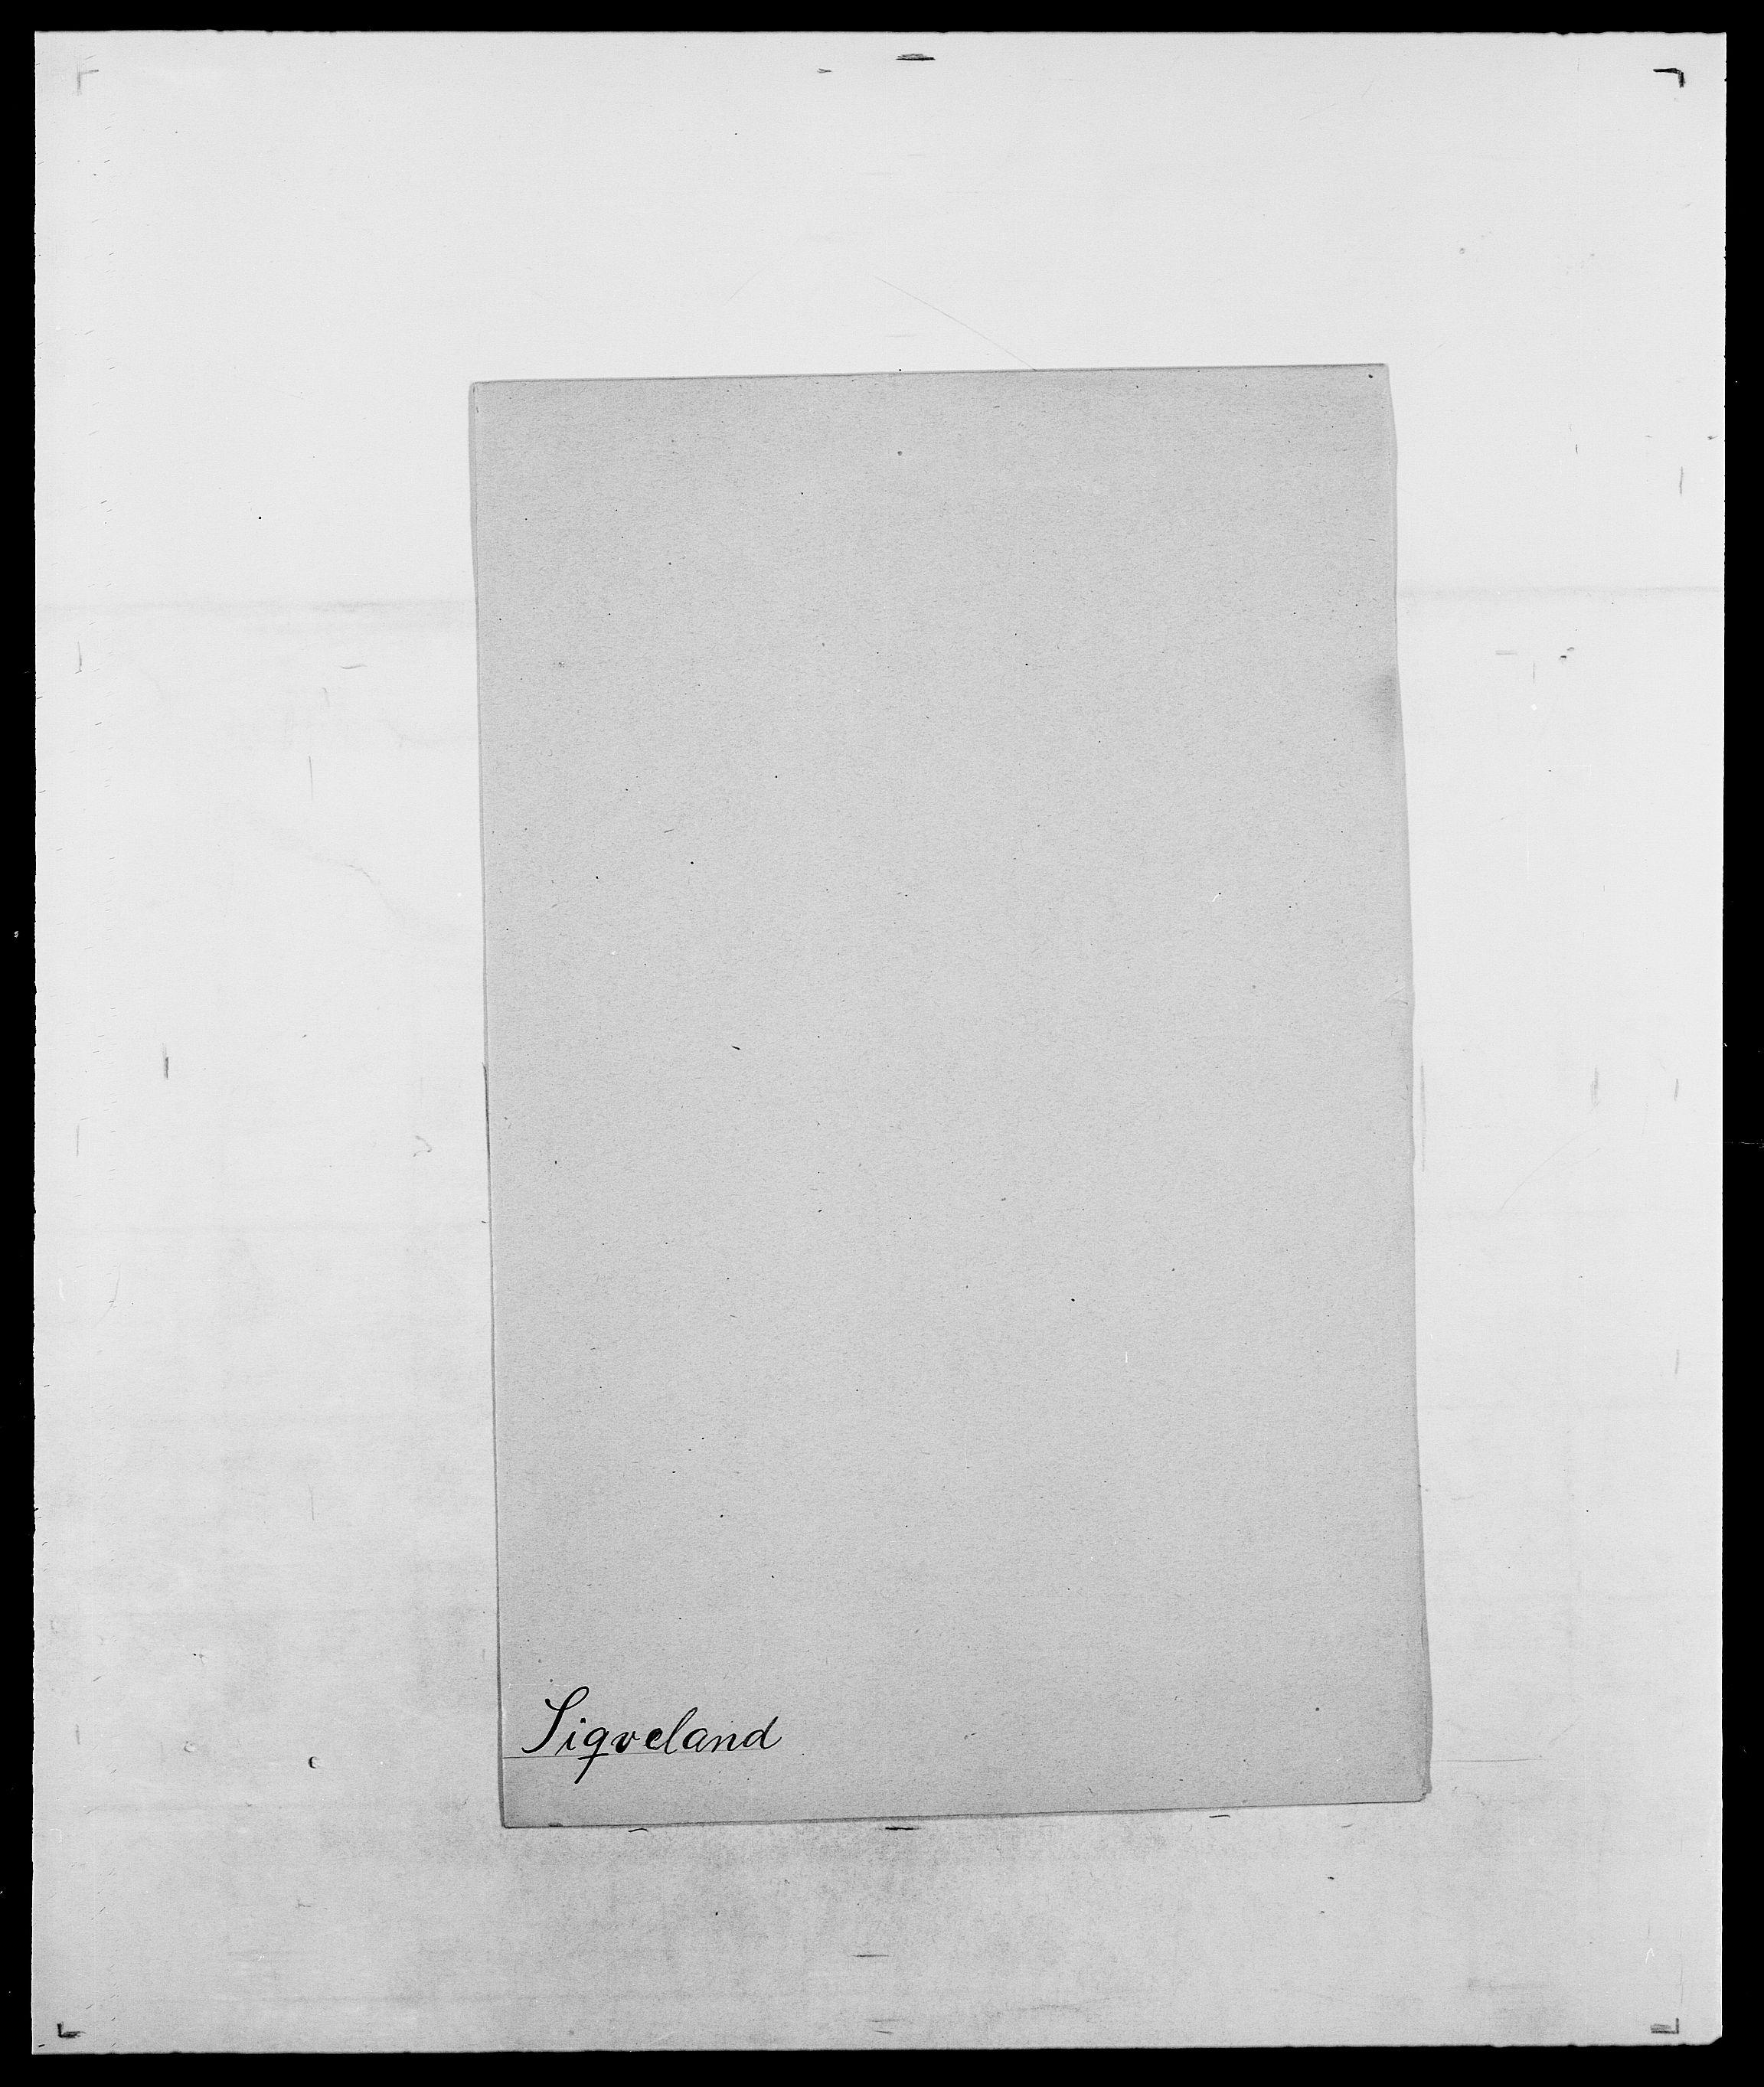 SAO, Delgobe, Charles Antoine - samling, D/Da/L0035: Schnabel - sjetman, s. 945